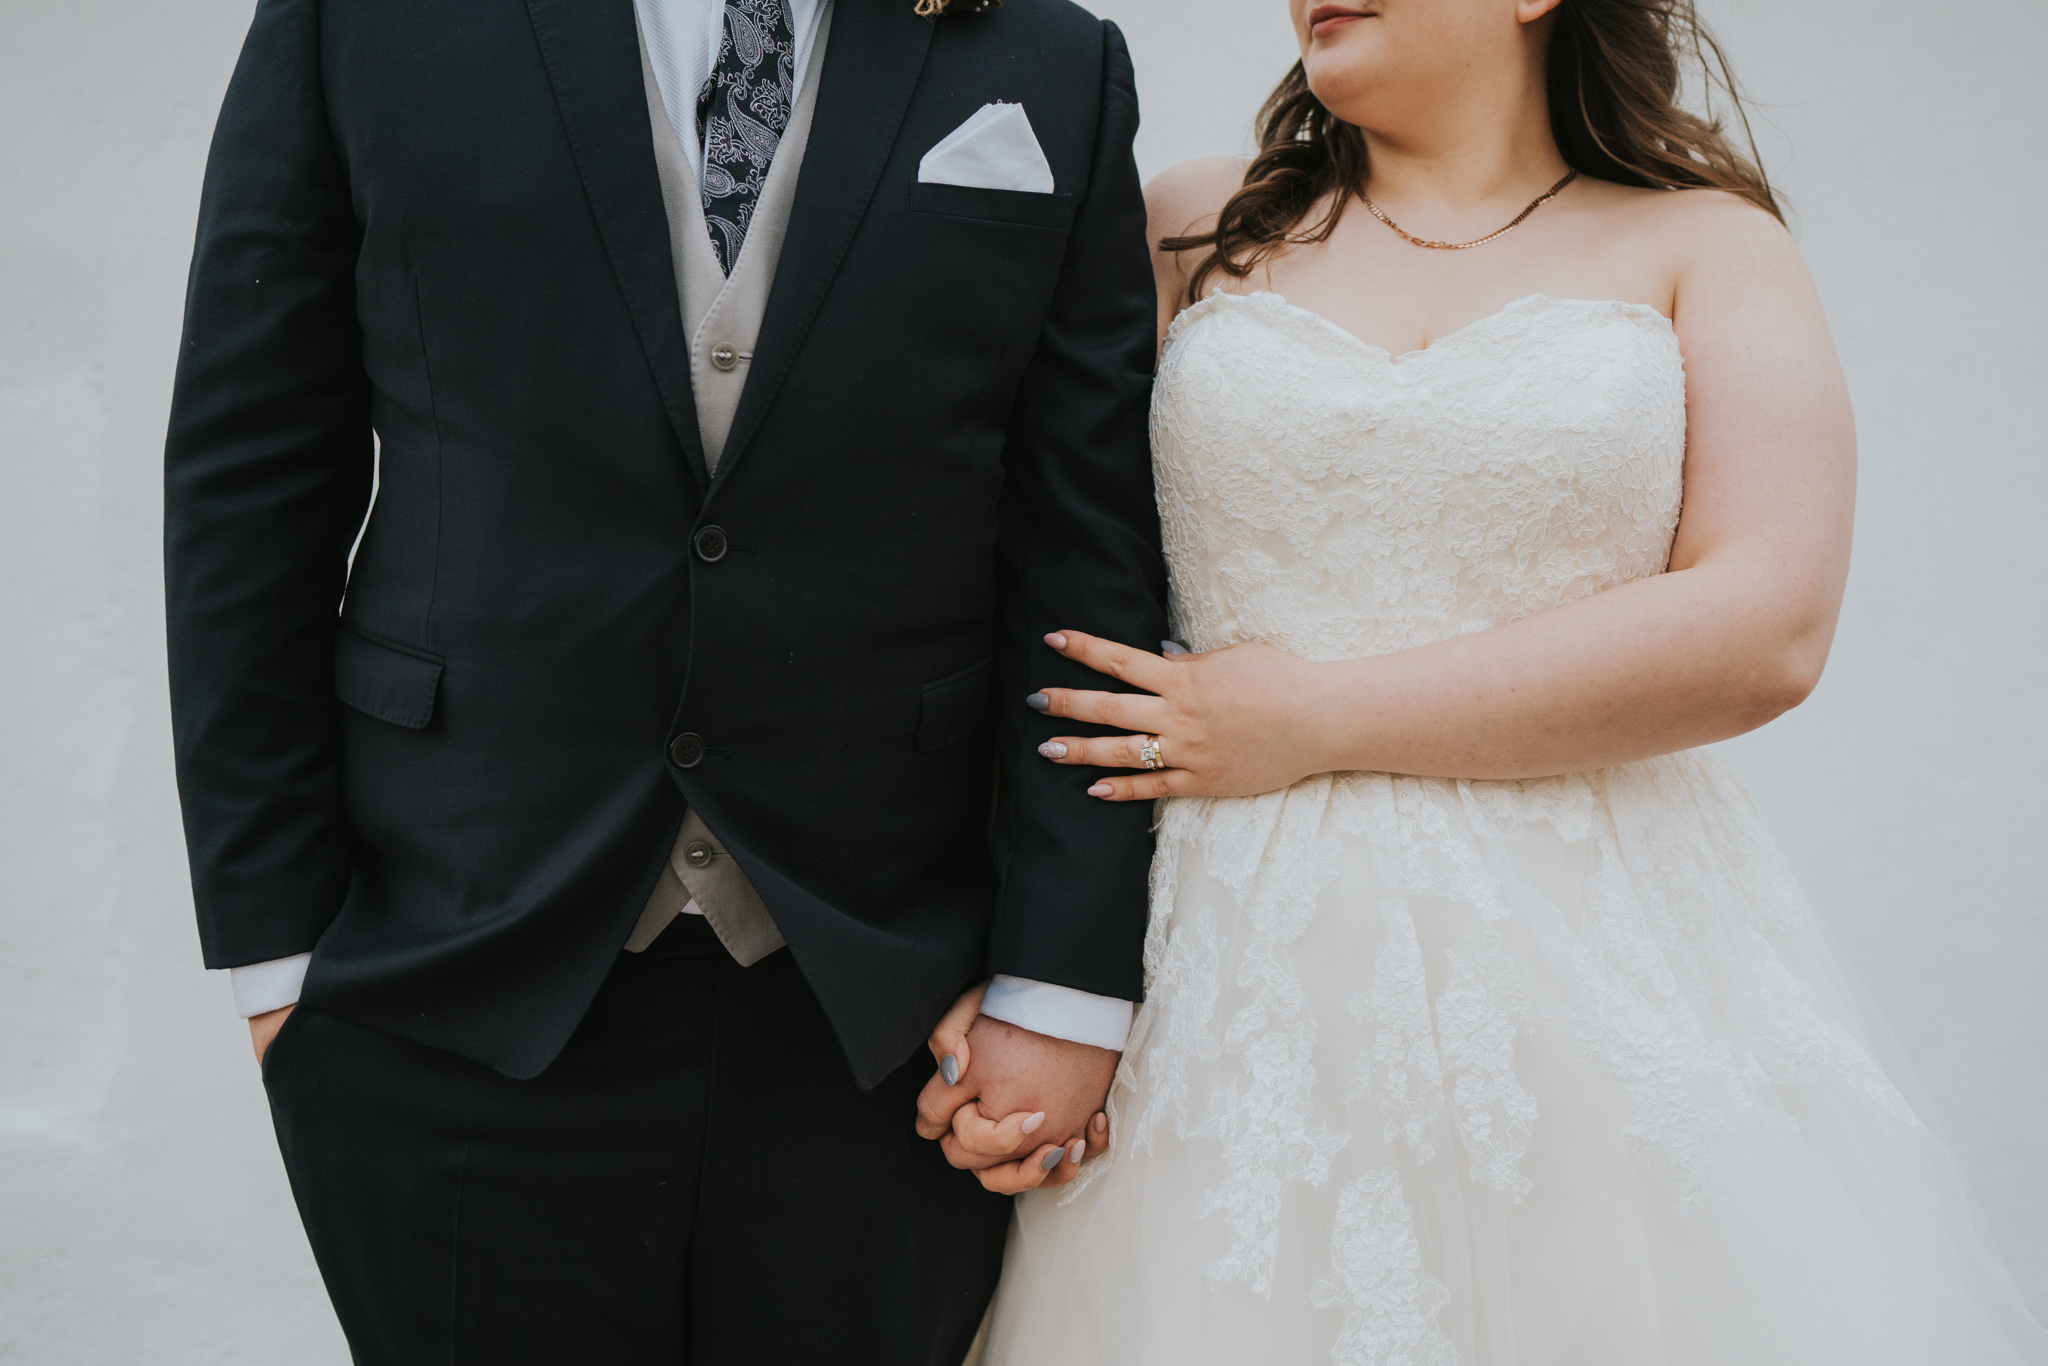 grace-sam-old-barn-clovelly-devon-wedding-photographer-grace-elizabeth-essex-suffolk-norfolk-wedding-photographer (112 of 132).jpg